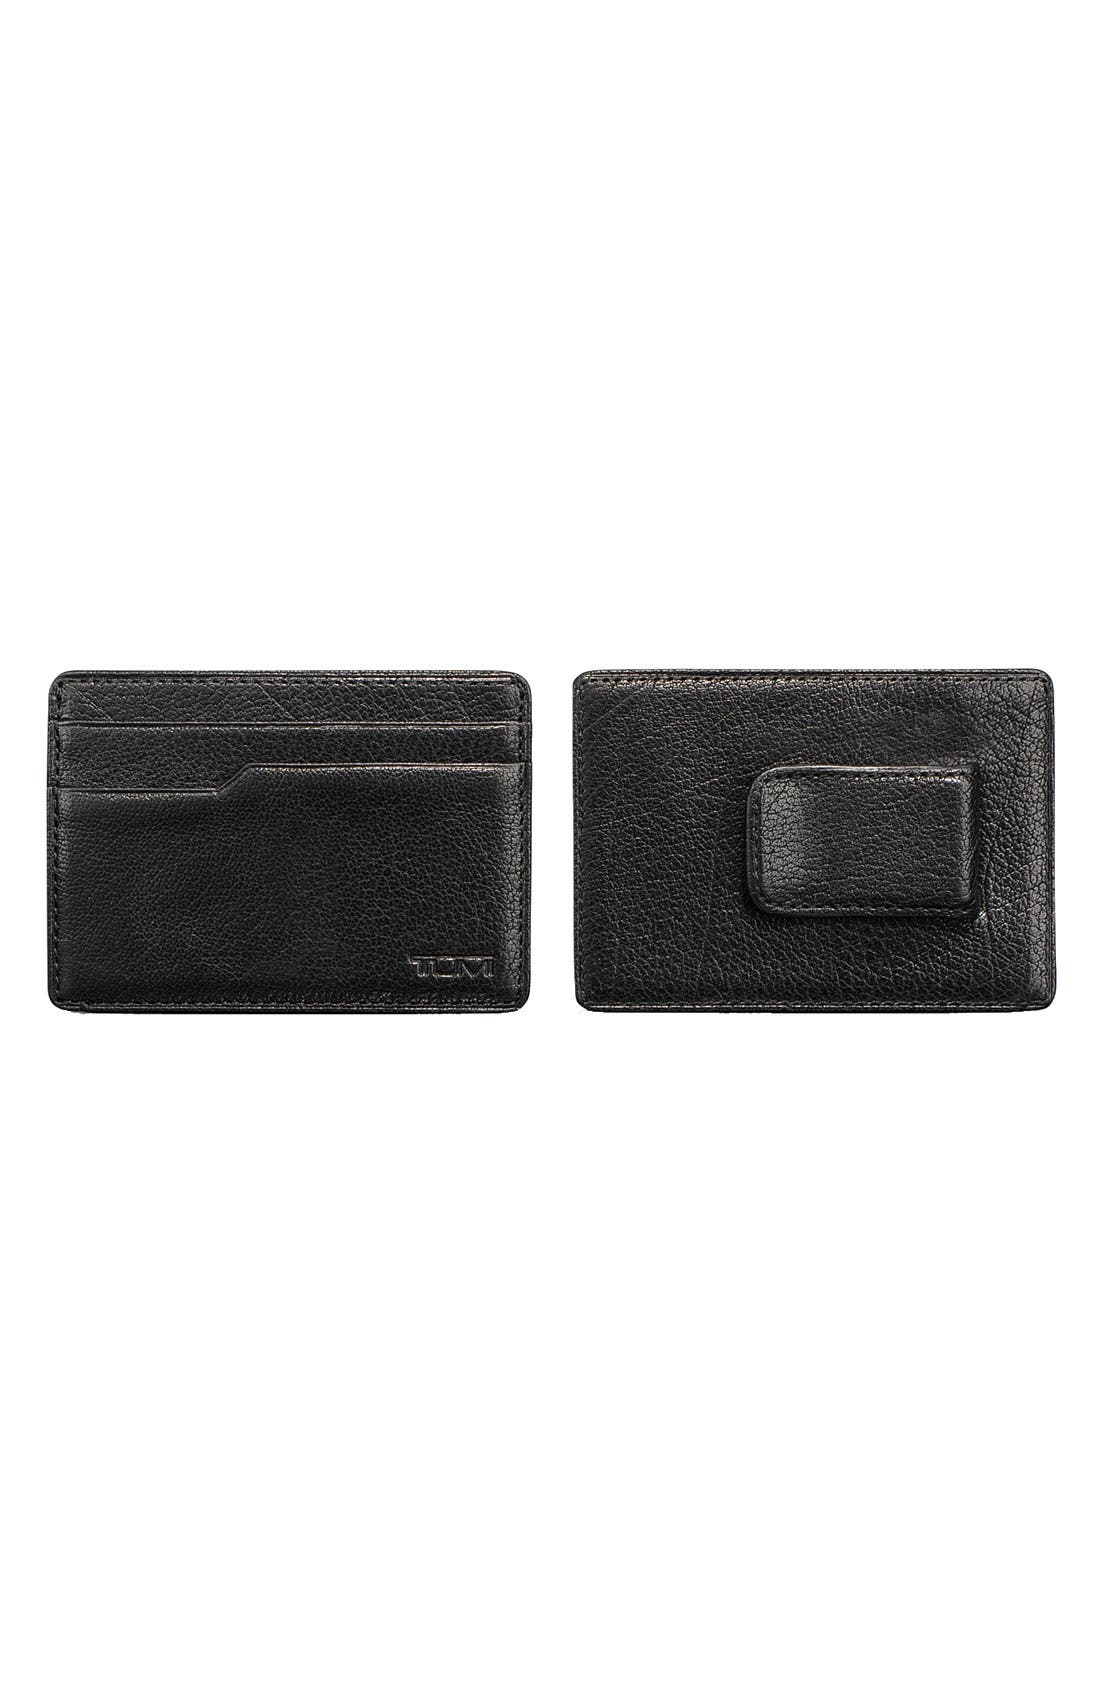 Main Image - Tumi 'Sierra' Money Clip Card Case